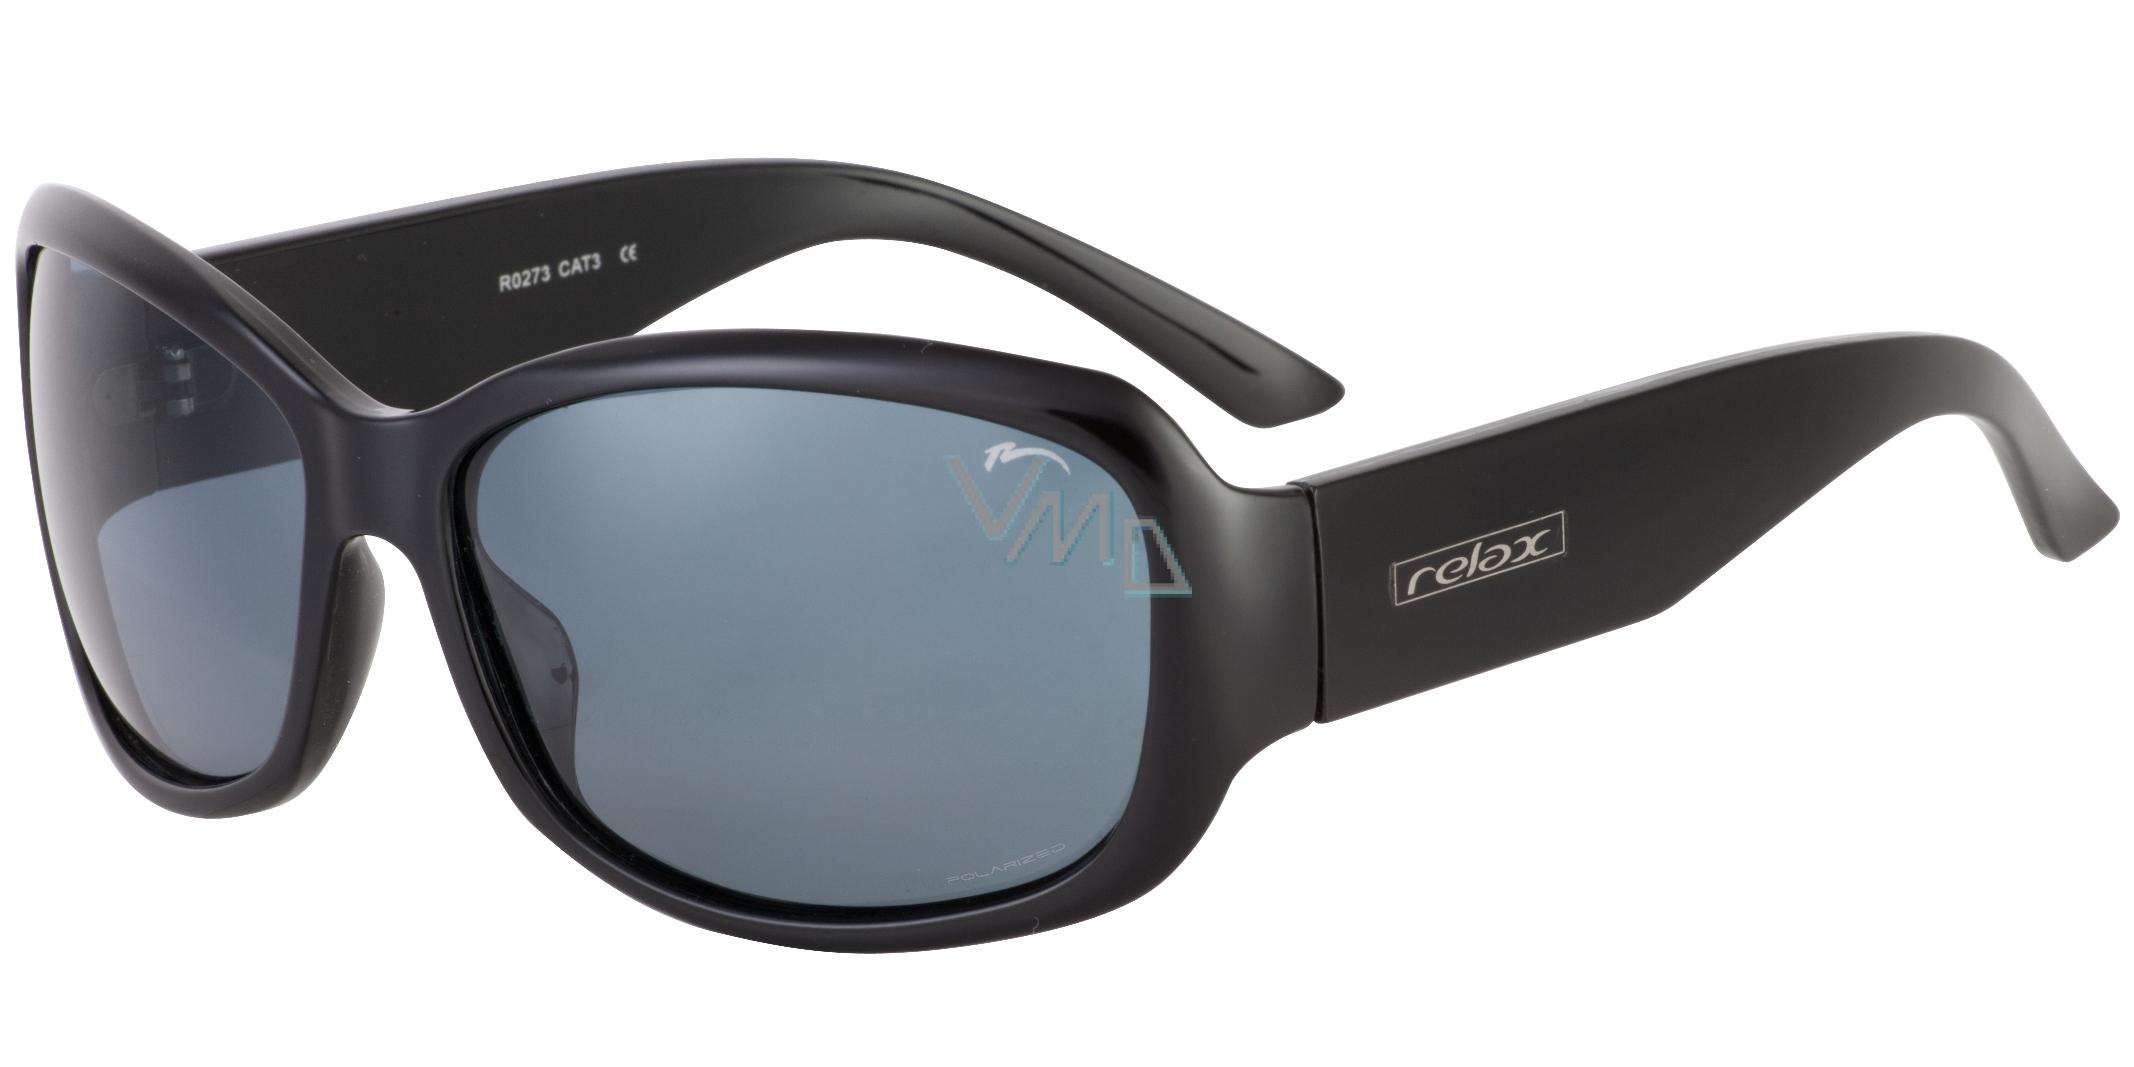 2a6c81758 Relax Georgia Sluneční brýle R0273 - VMD drogerie